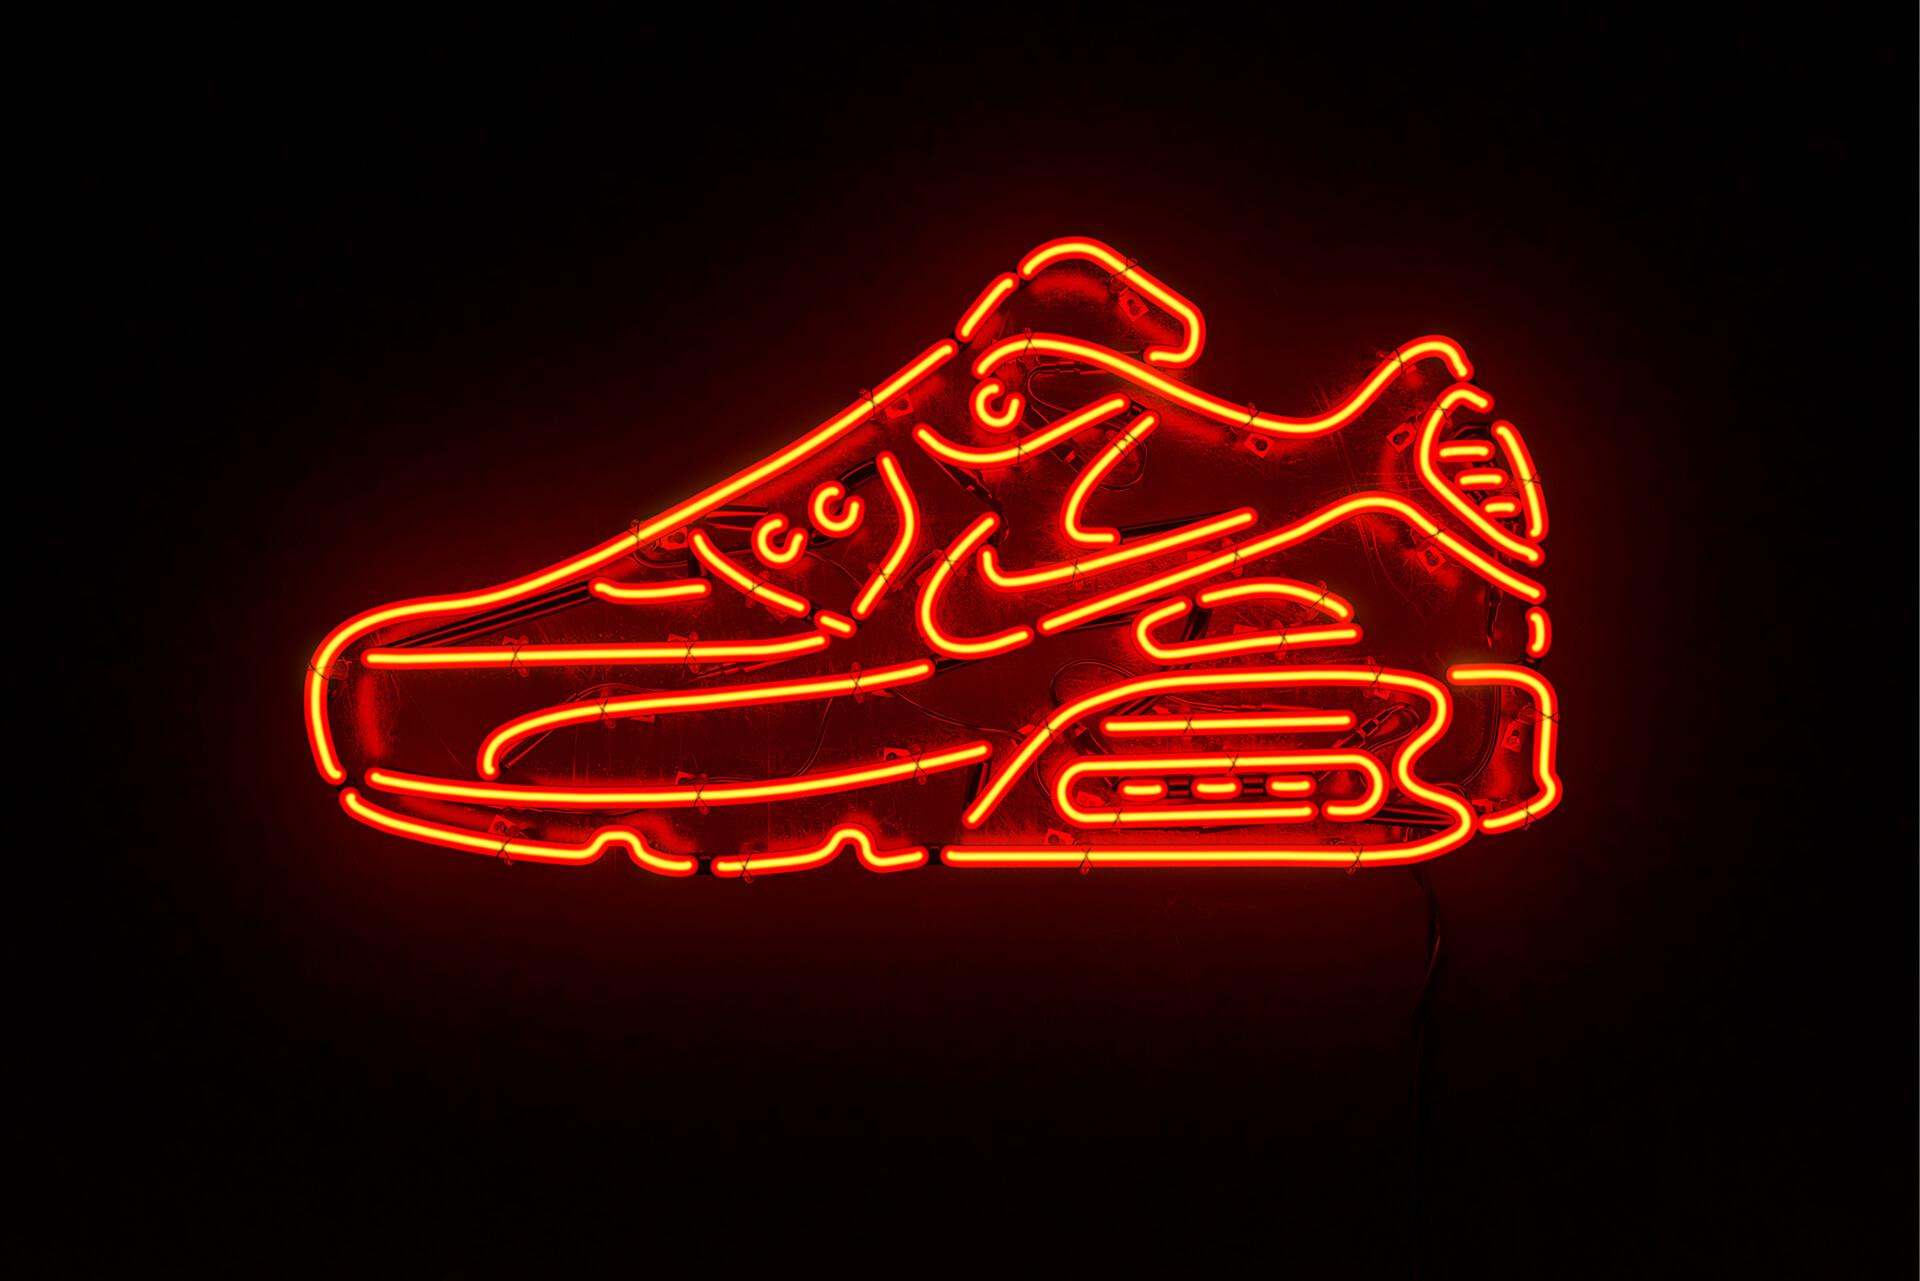 nike air max neon sign